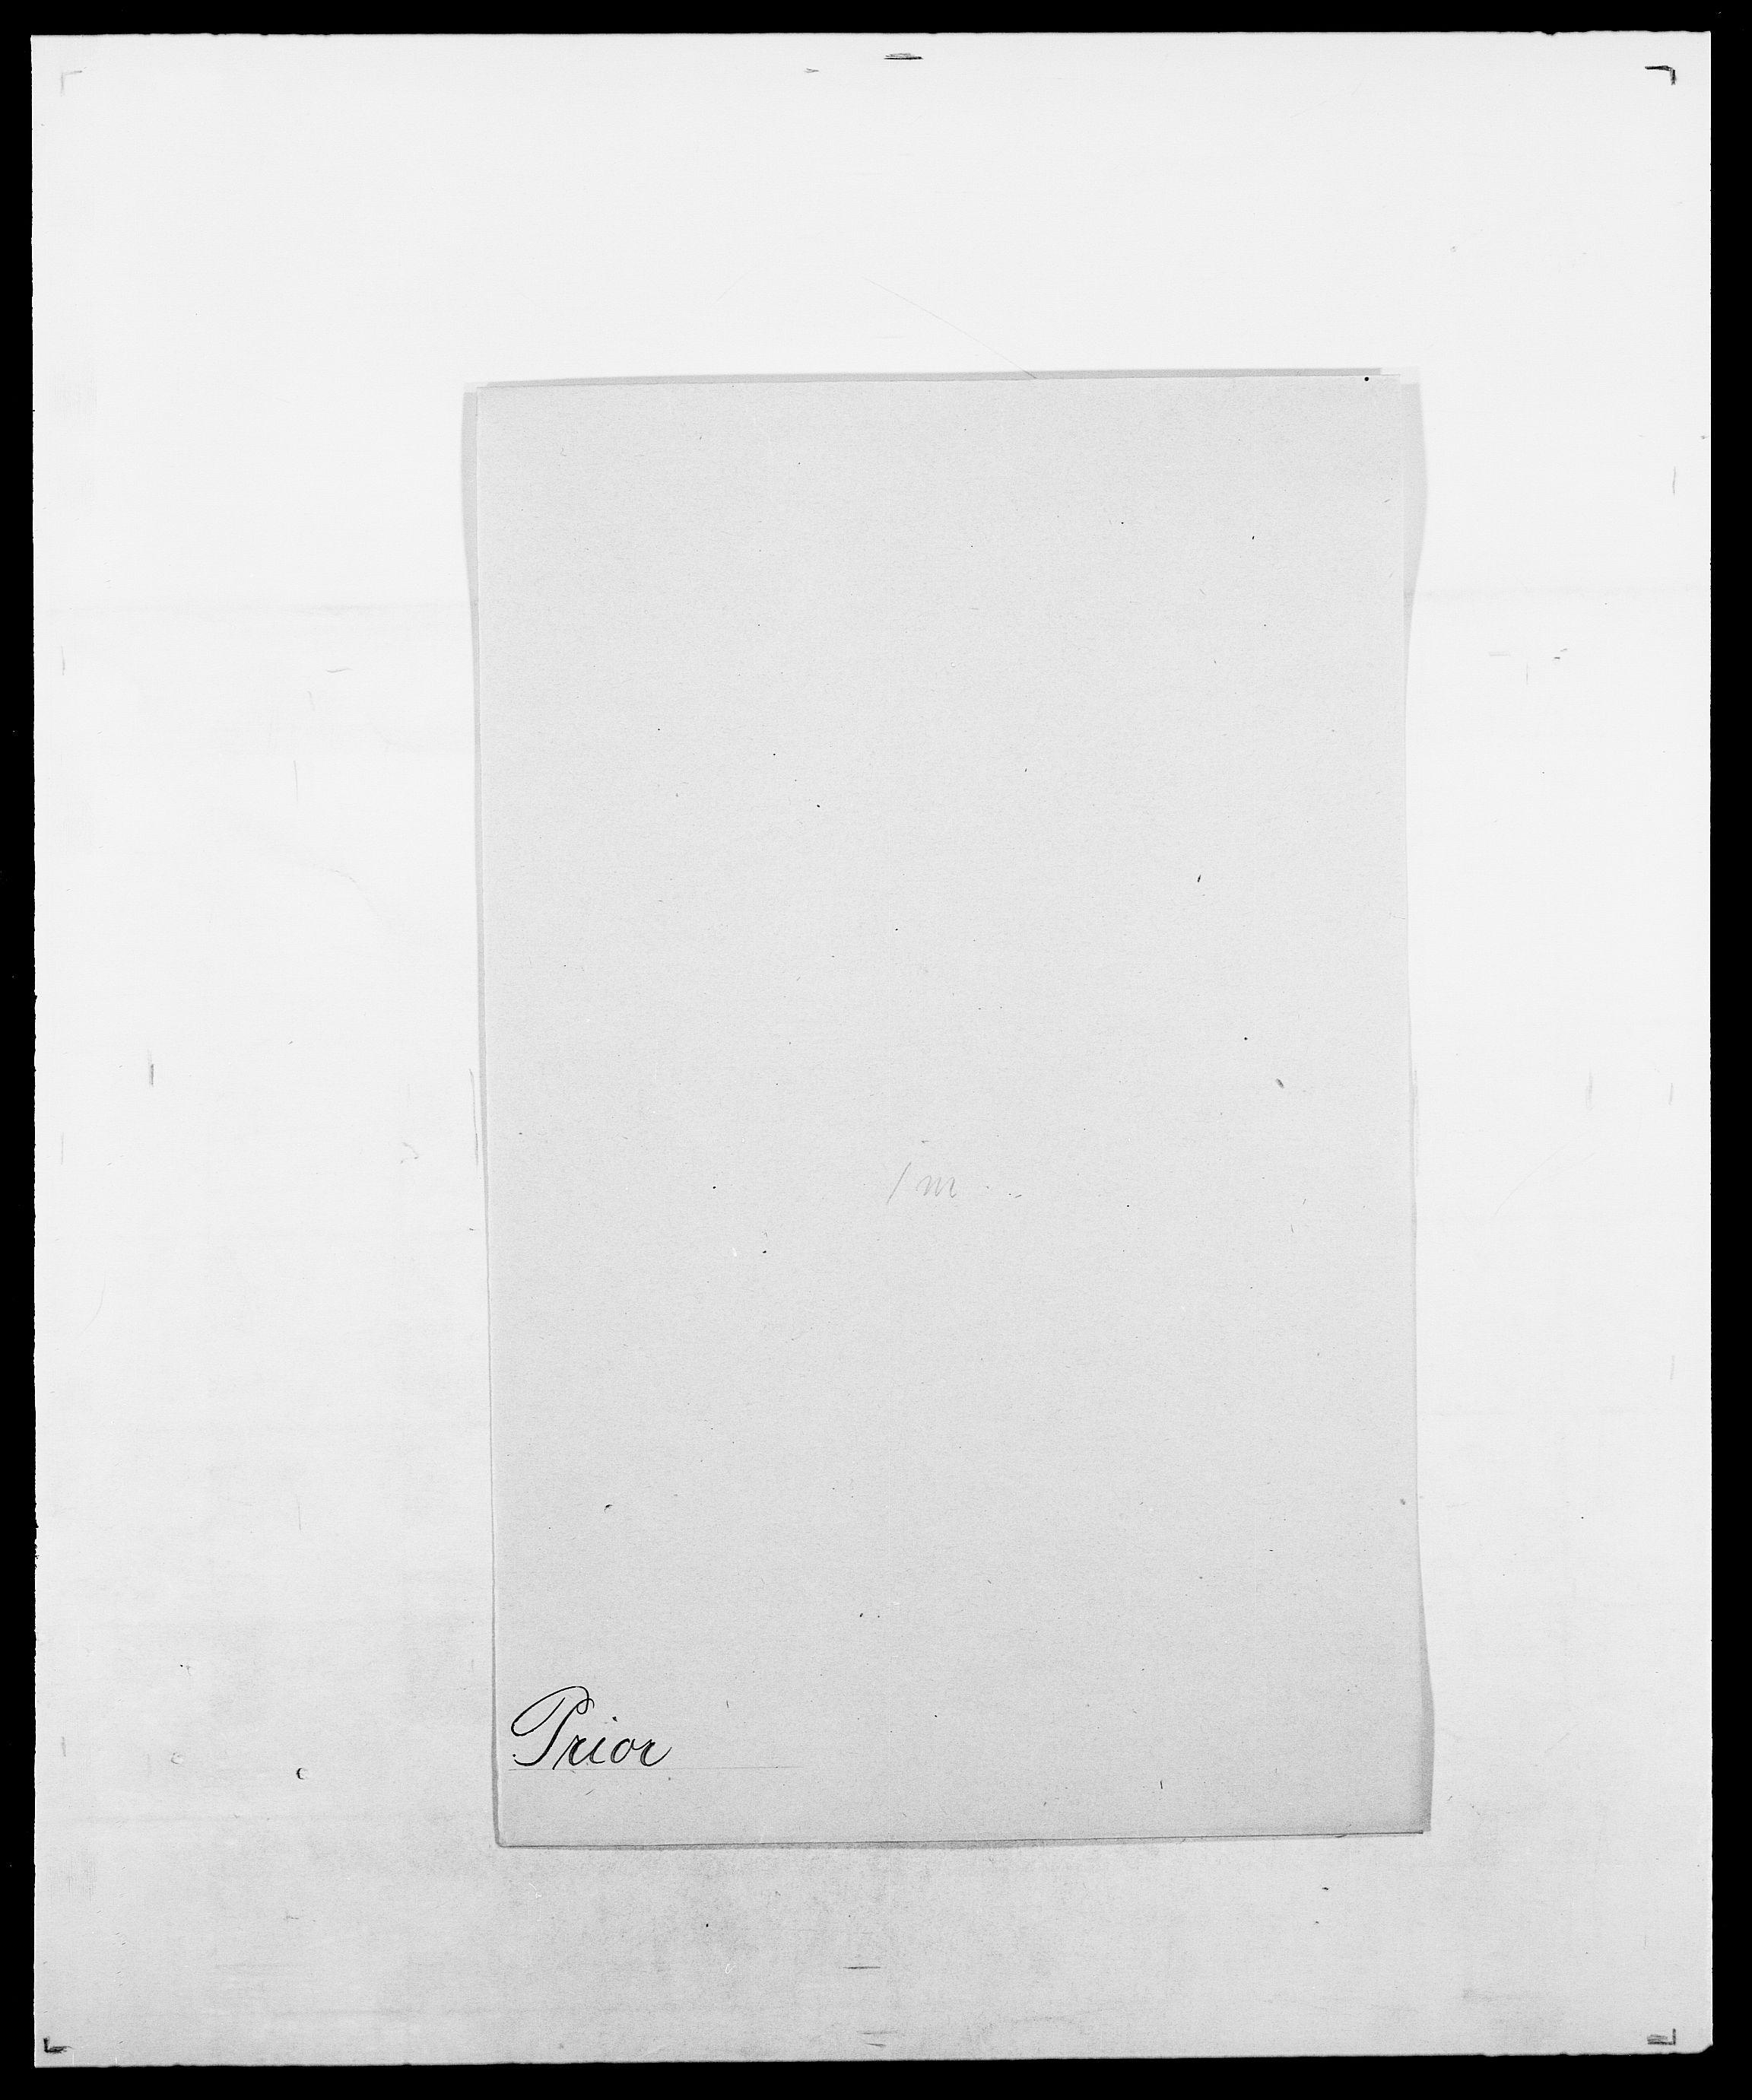 SAO, Delgobe, Charles Antoine - samling, D/Da/L0031: de Place - Raaum, s. 351